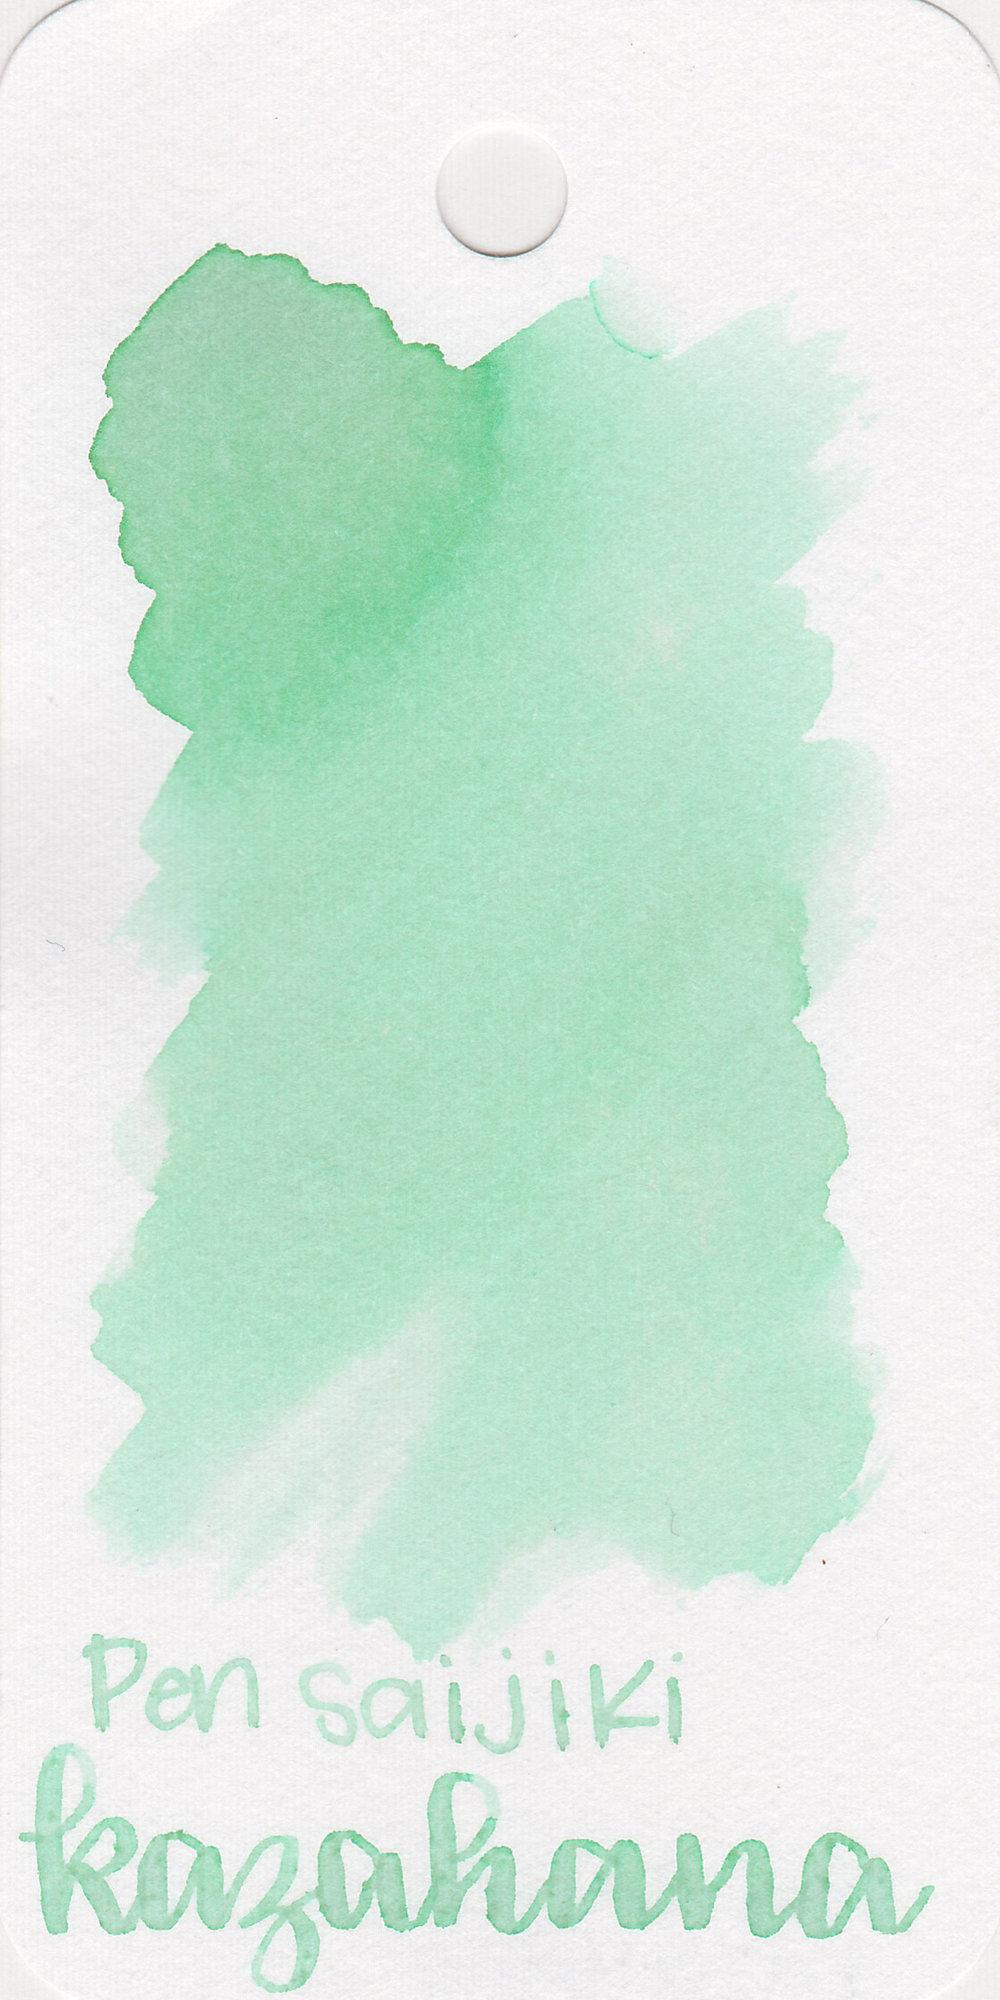 The color: - Kazahana is a very light mint green.